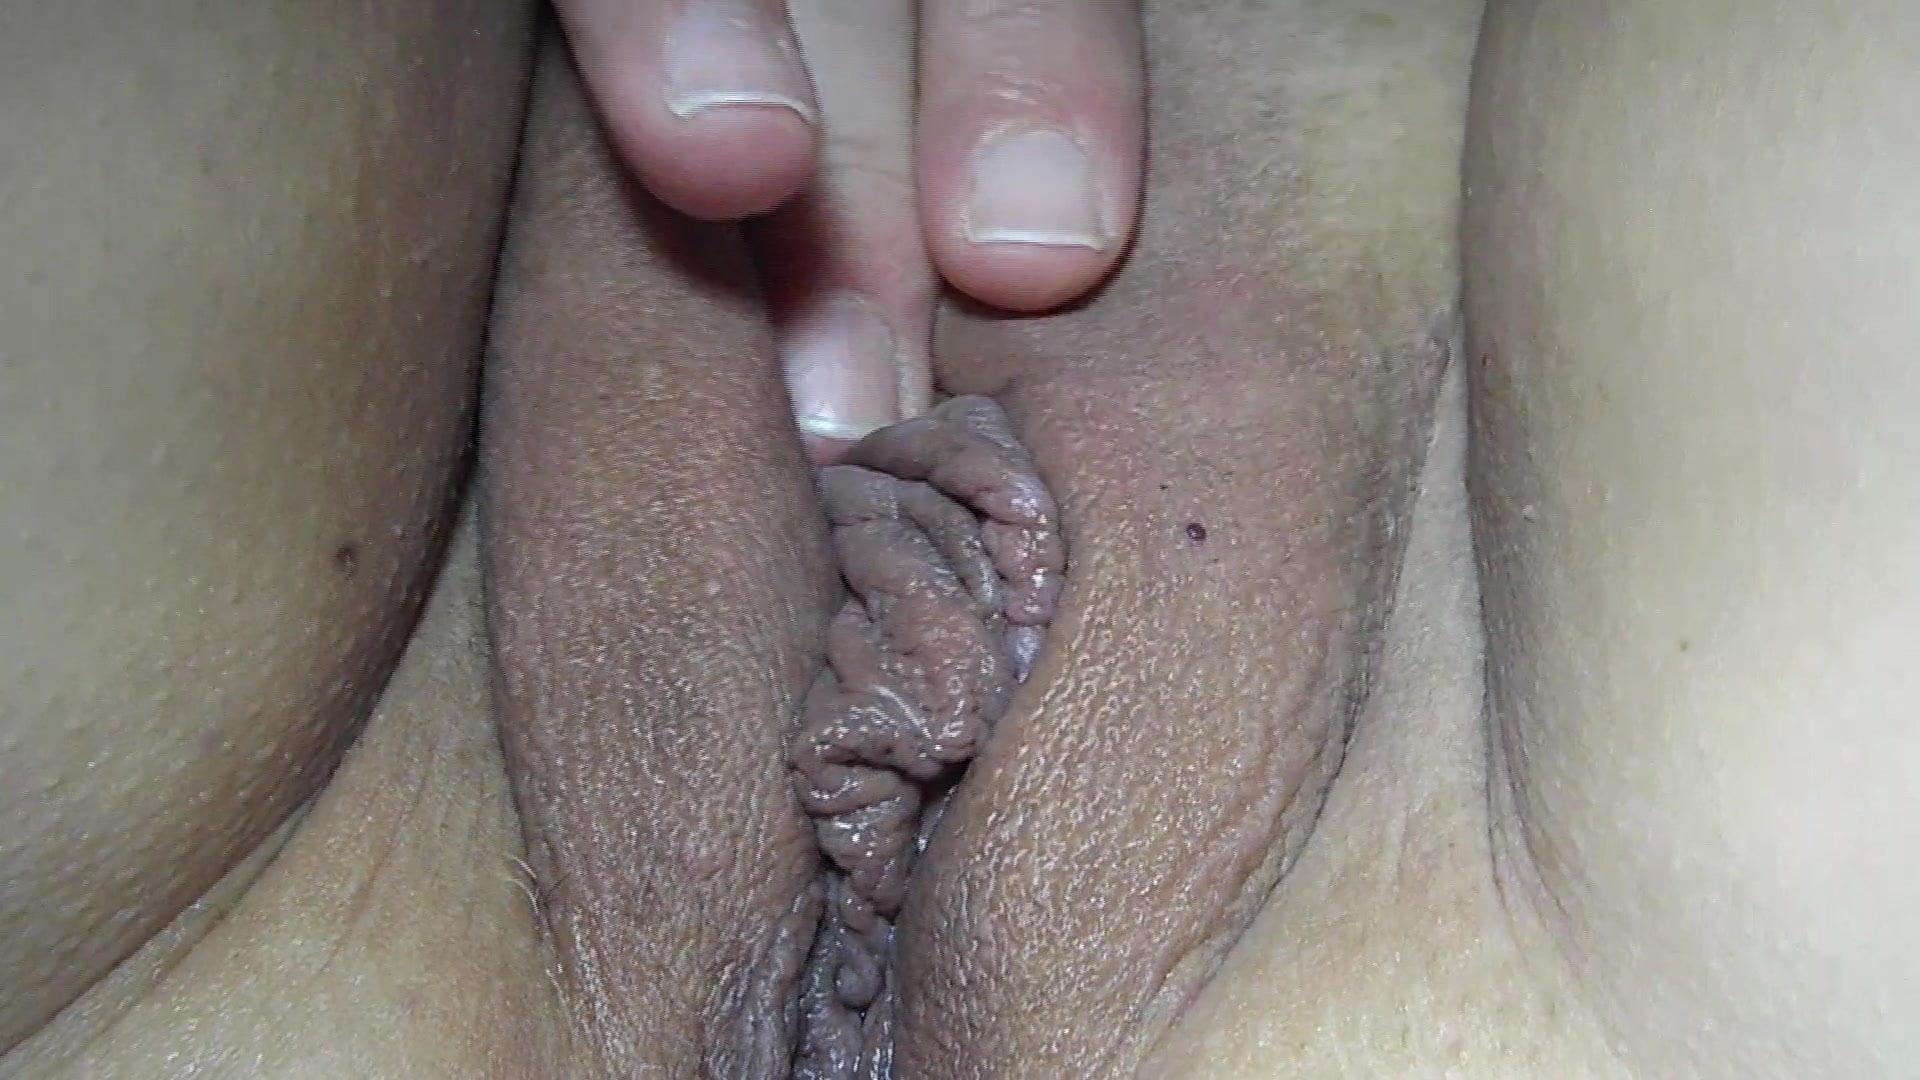 Creamy orgasmic goo oozing out of pussy